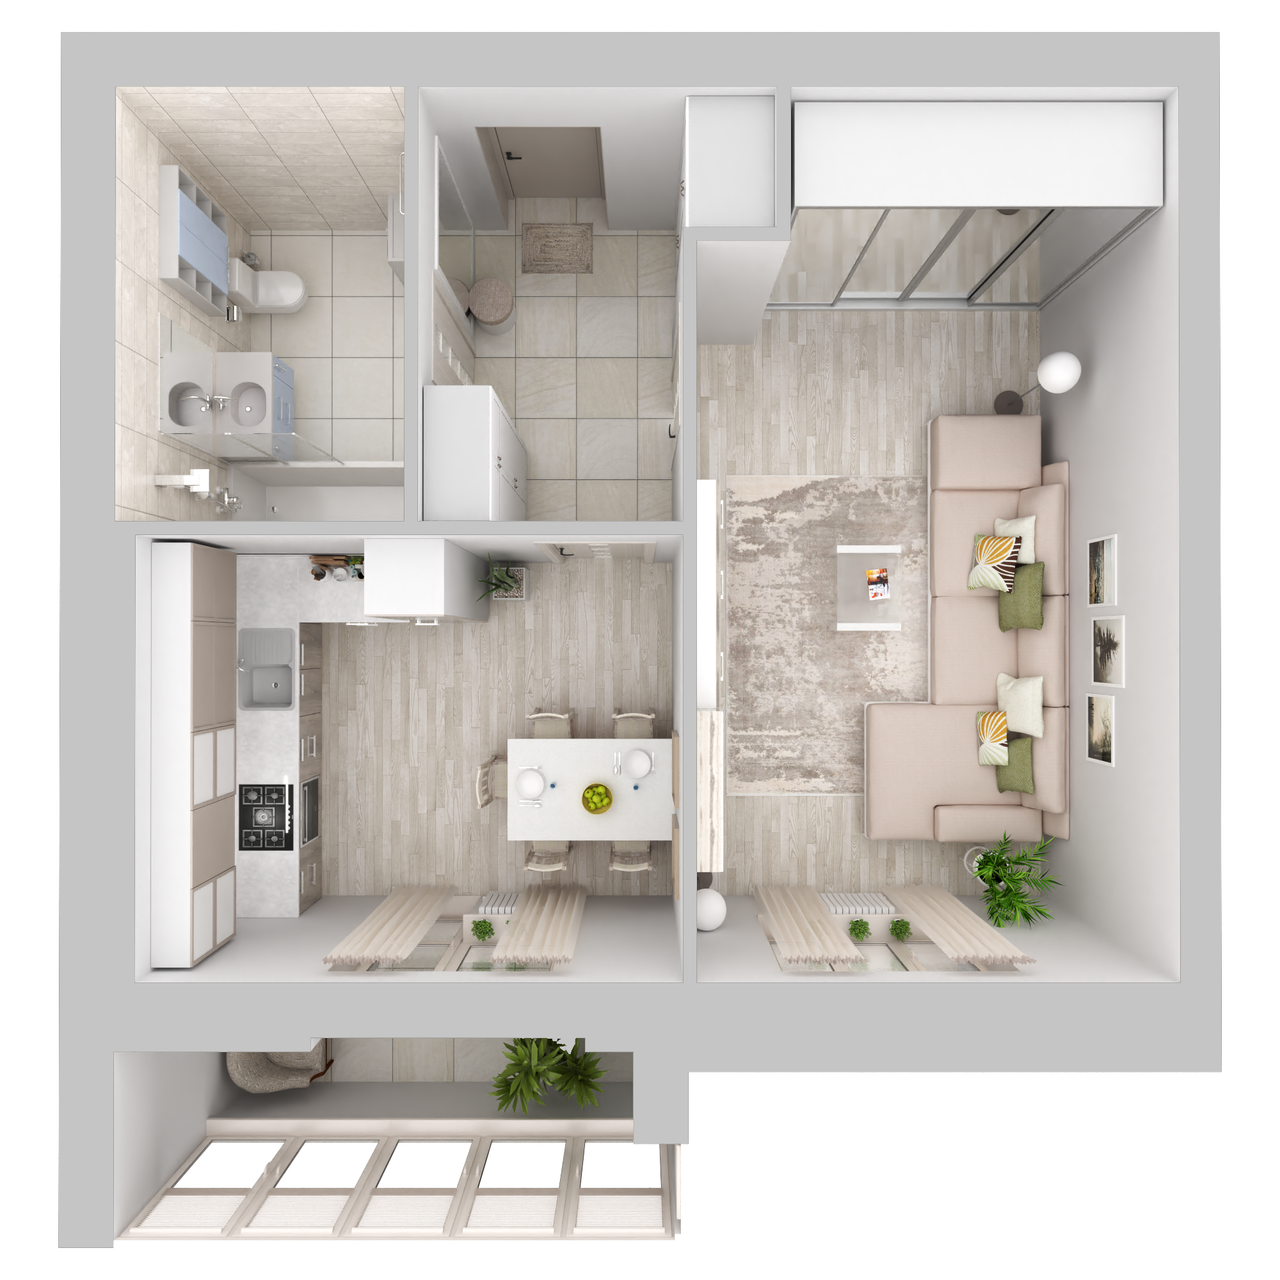 Дом 6 - 1-комнатная №80